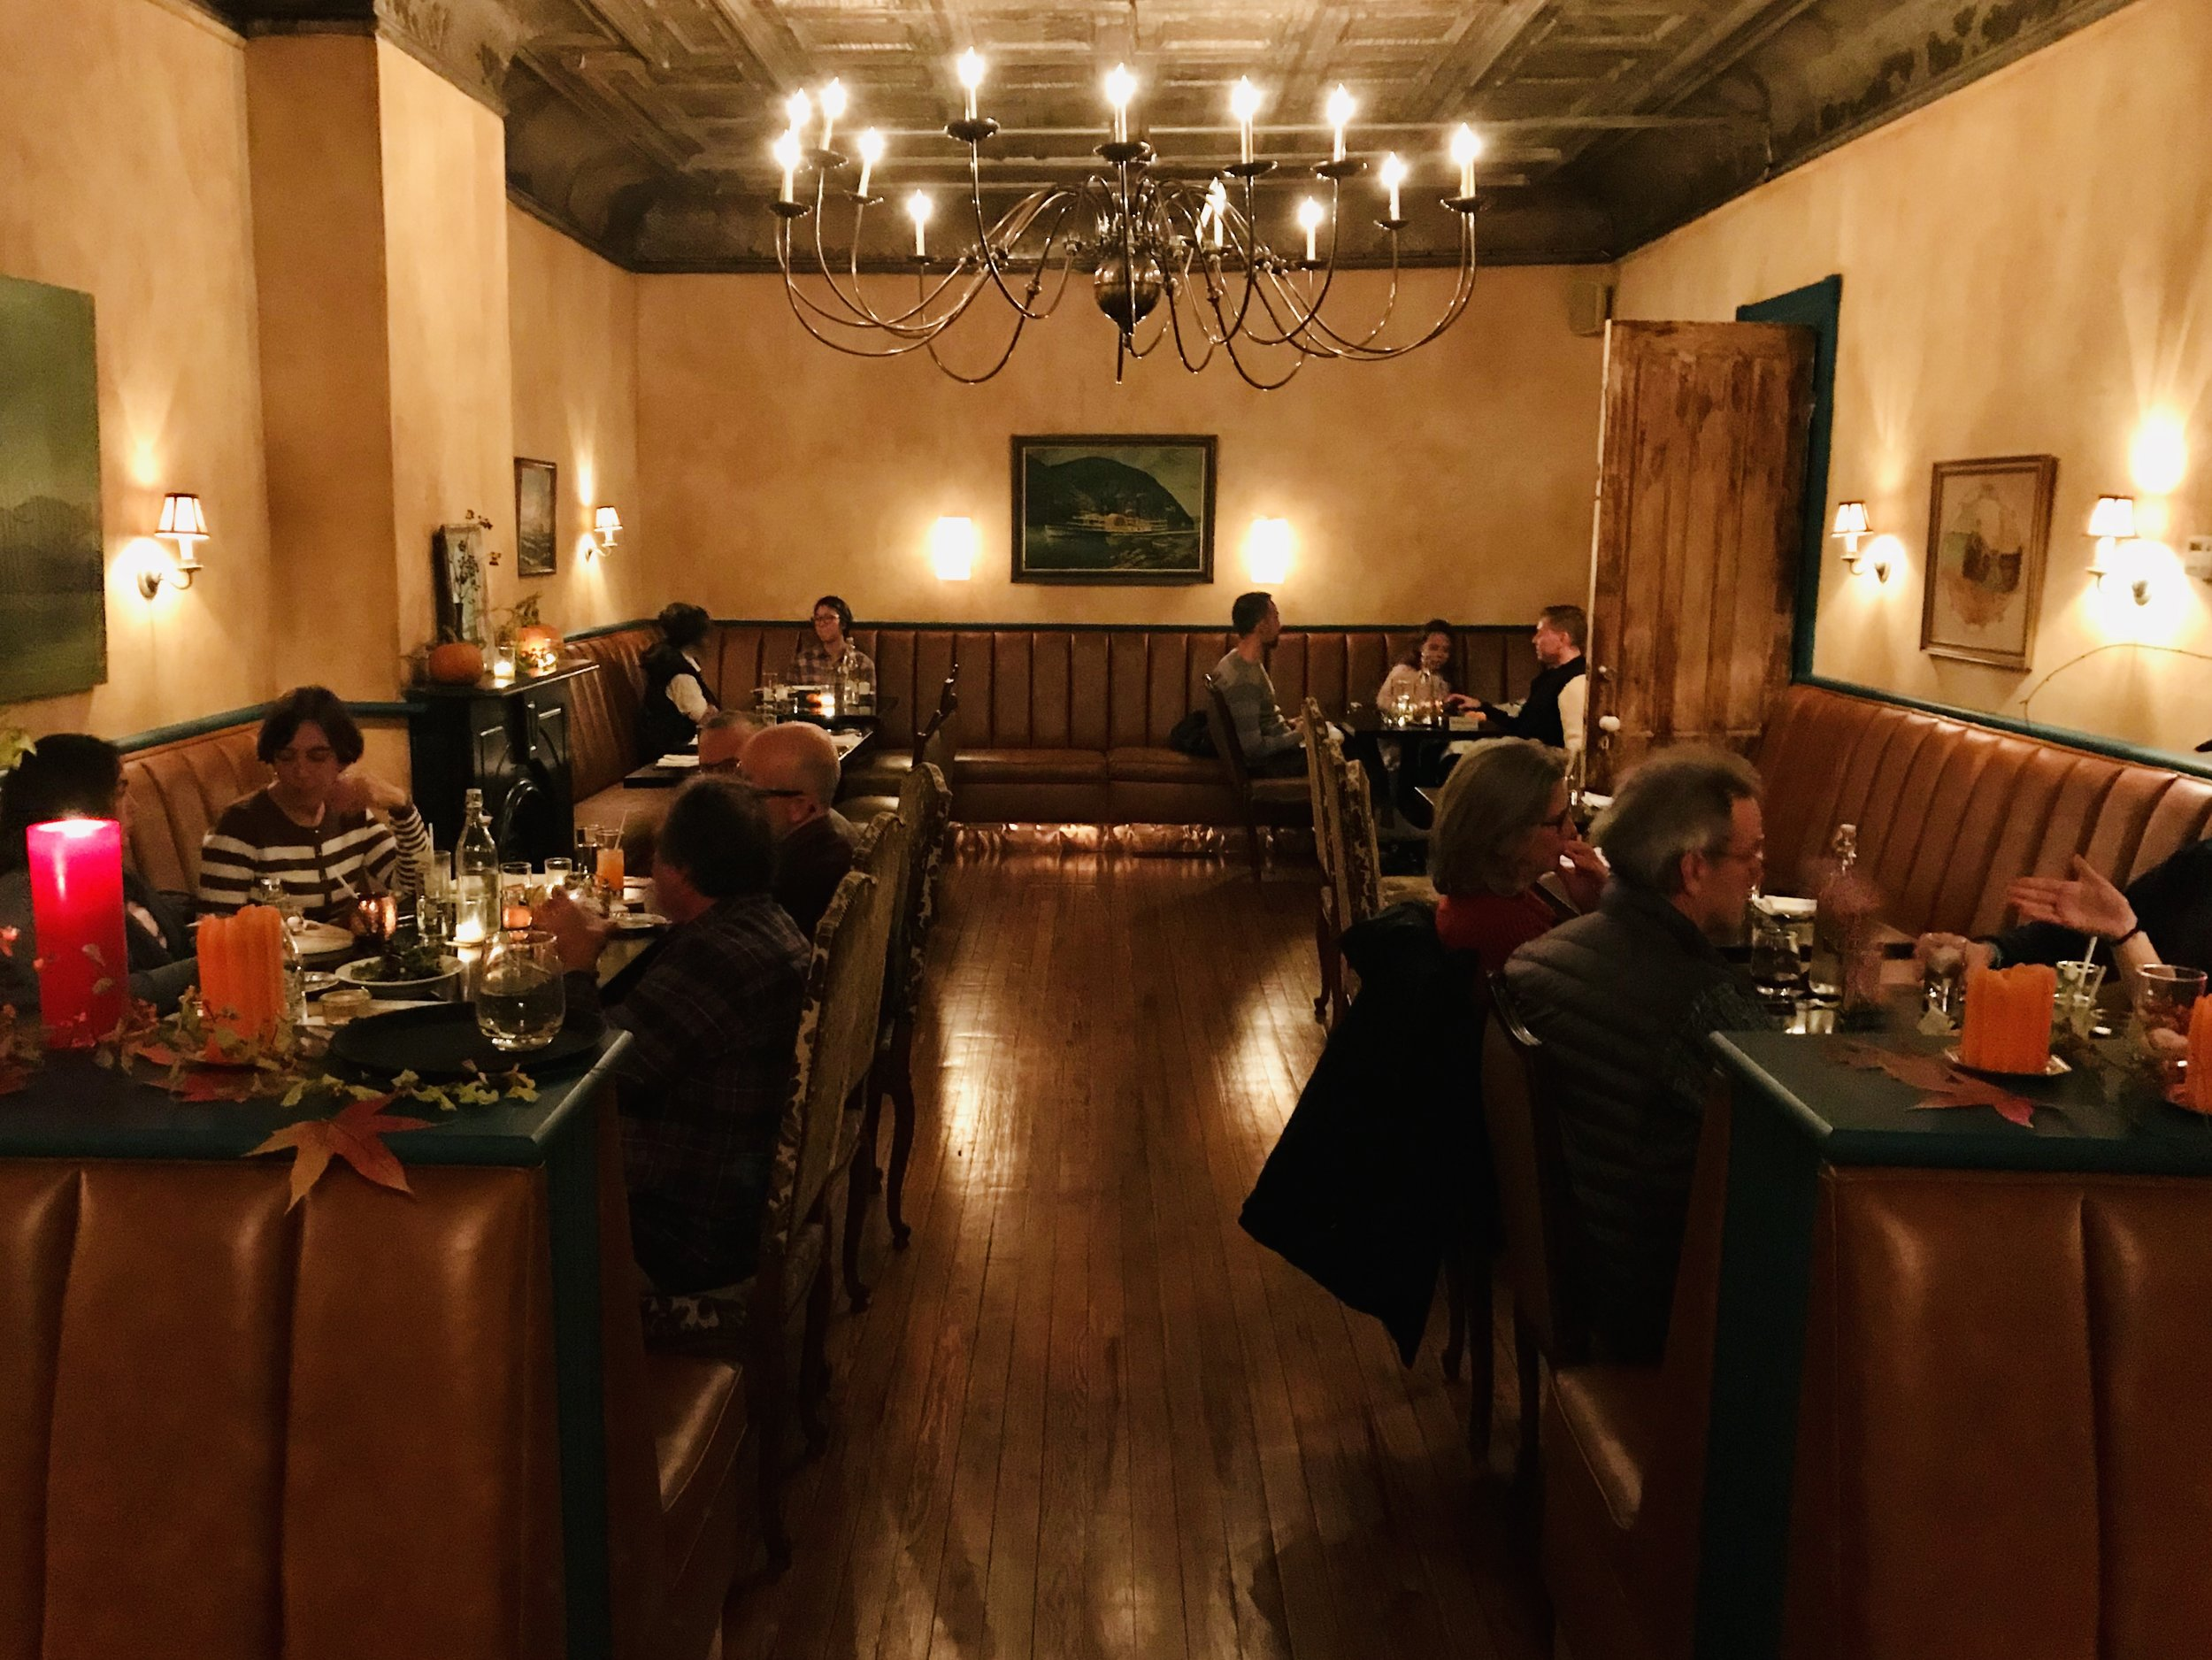 HudsonValley360: Historic Athens Inn - By Daniel Zuckerman